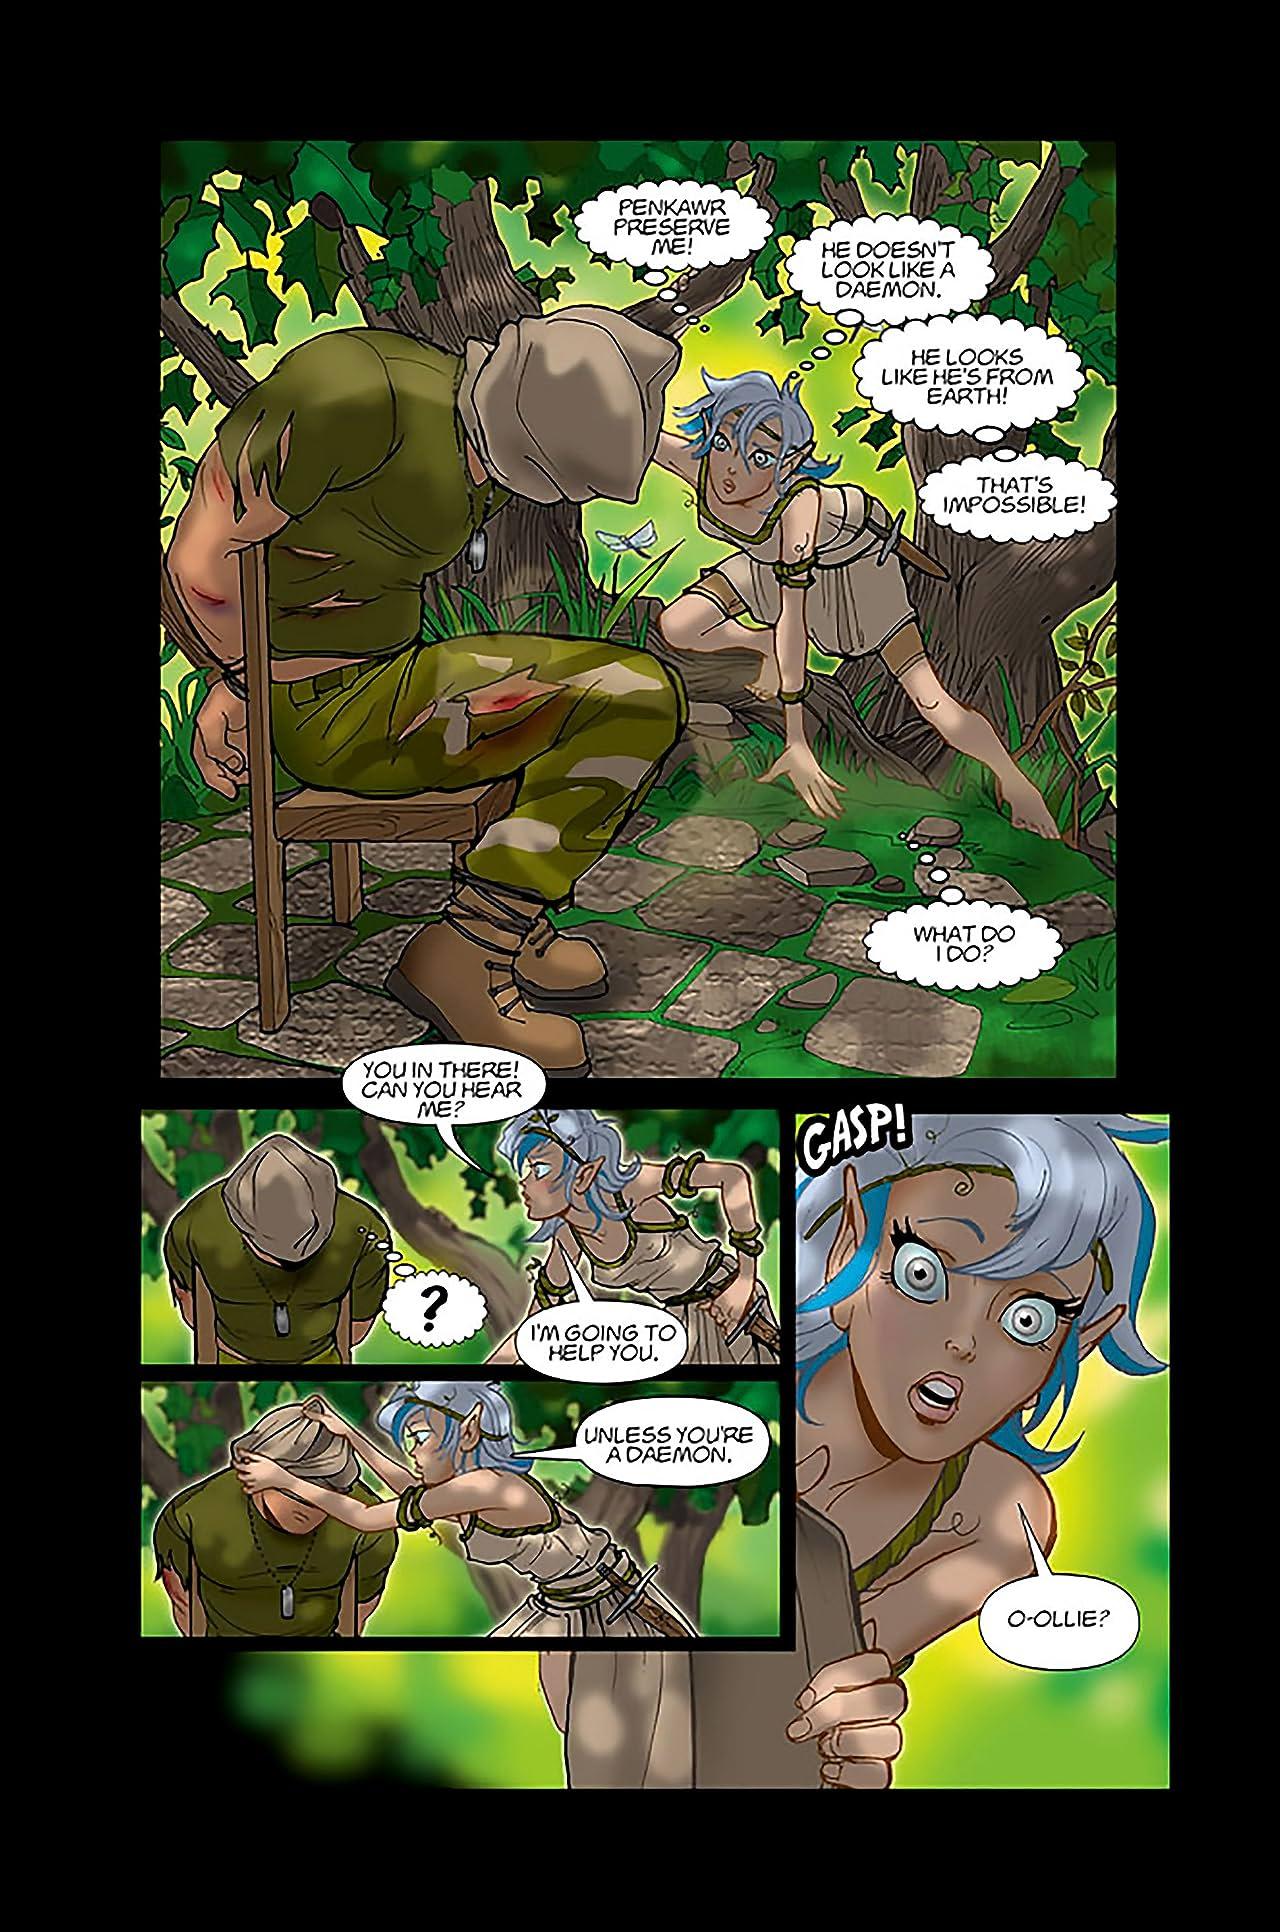 Talismen: Return of the Exile #1